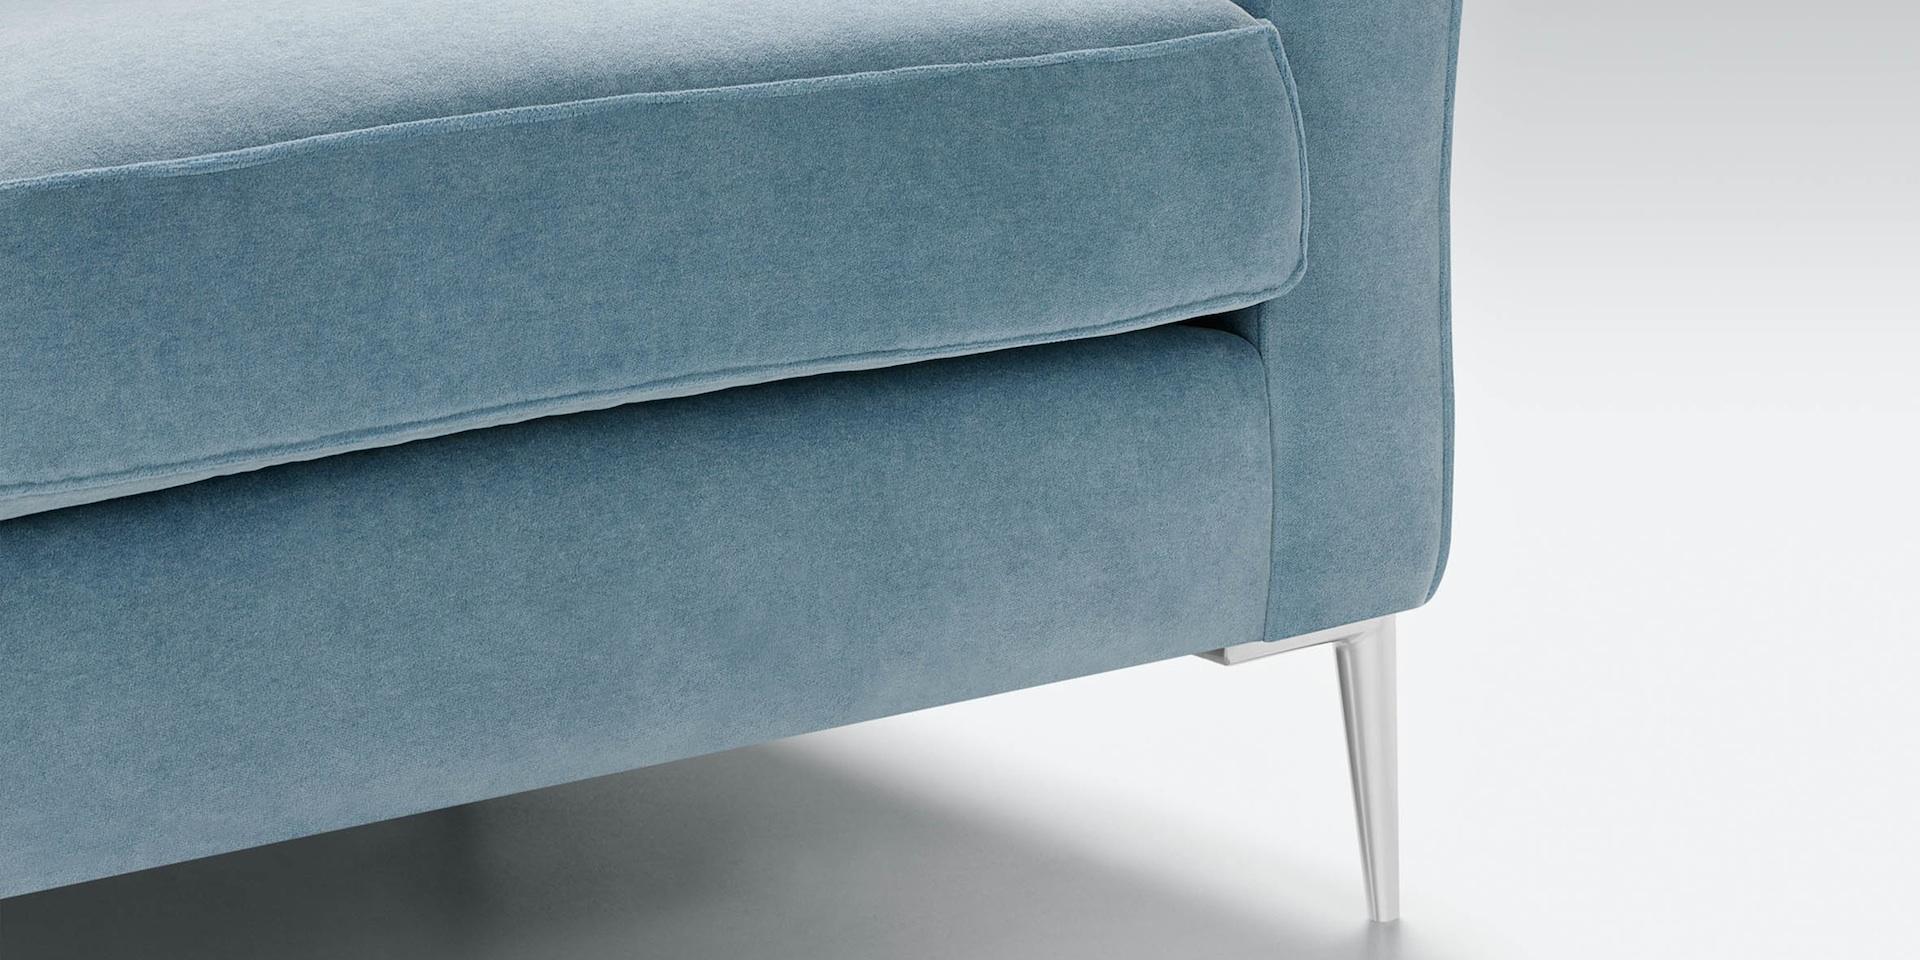 CAPRICE_shadow_armchair_malibu_velvet5_blue_6